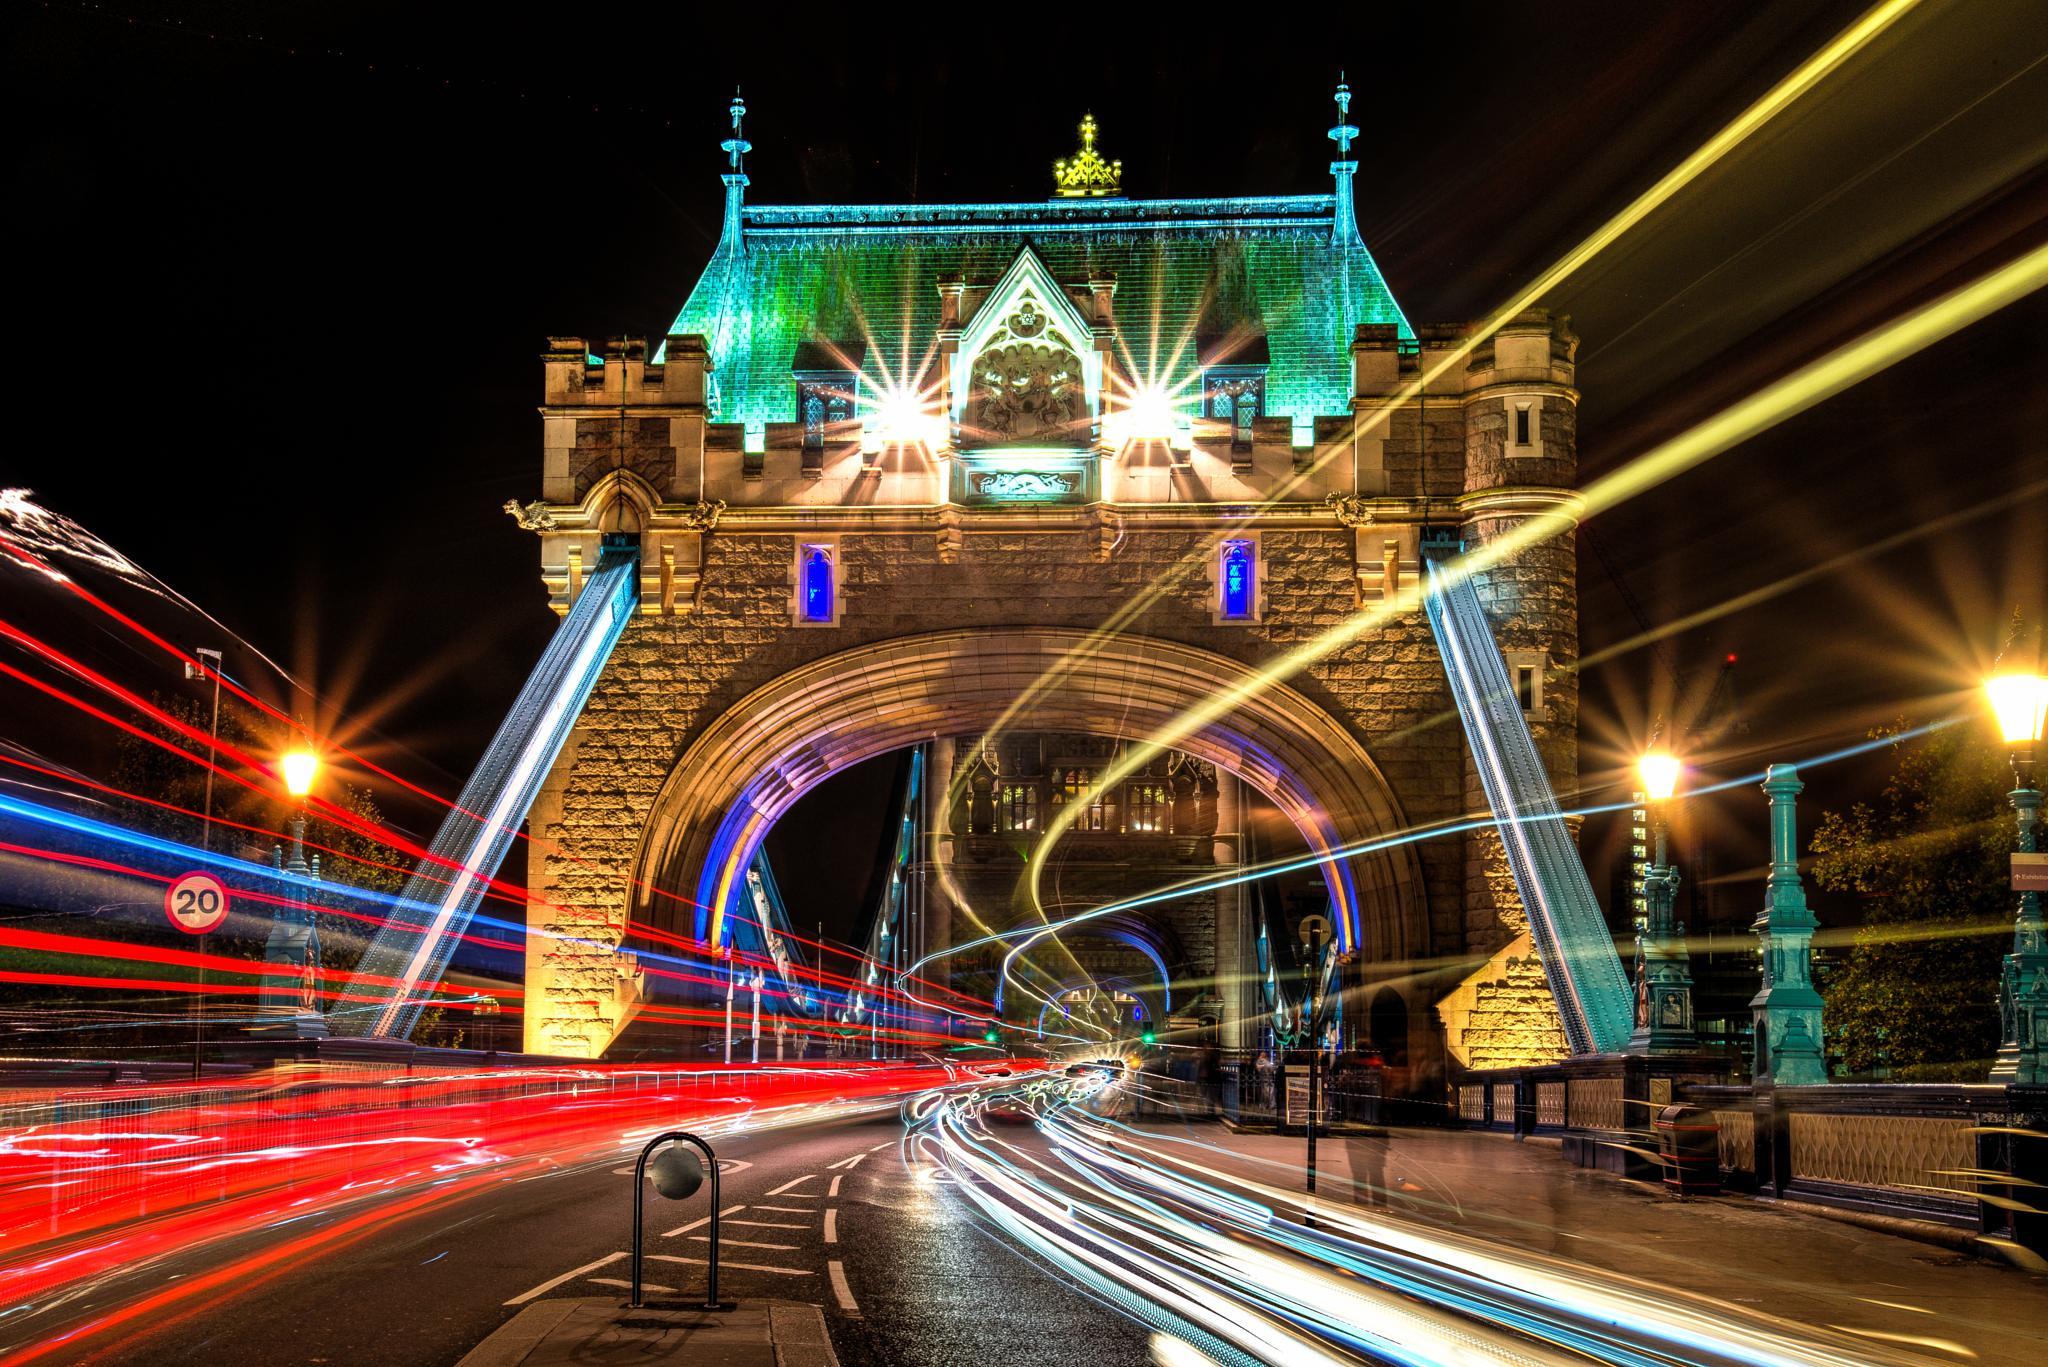 Tower Bridge by Lukas Proszowski